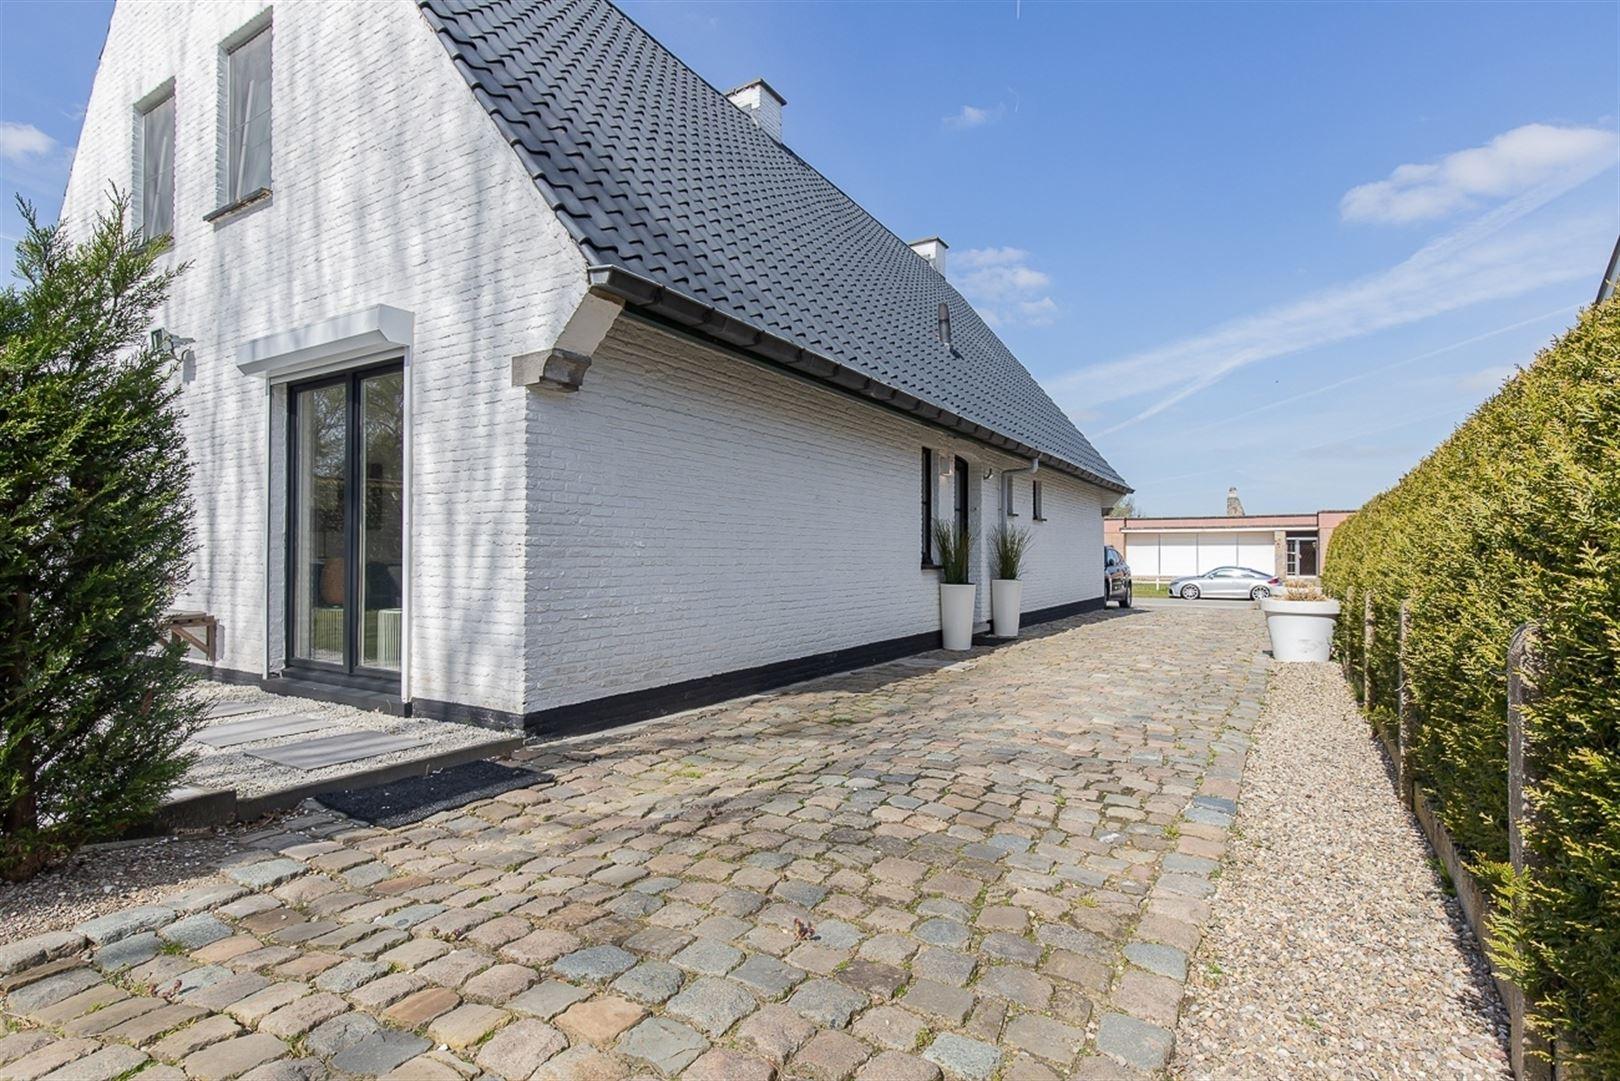 Foto 26 : Villa te 9100 SINT-NIKLAAS (België) - Prijs € 549.000